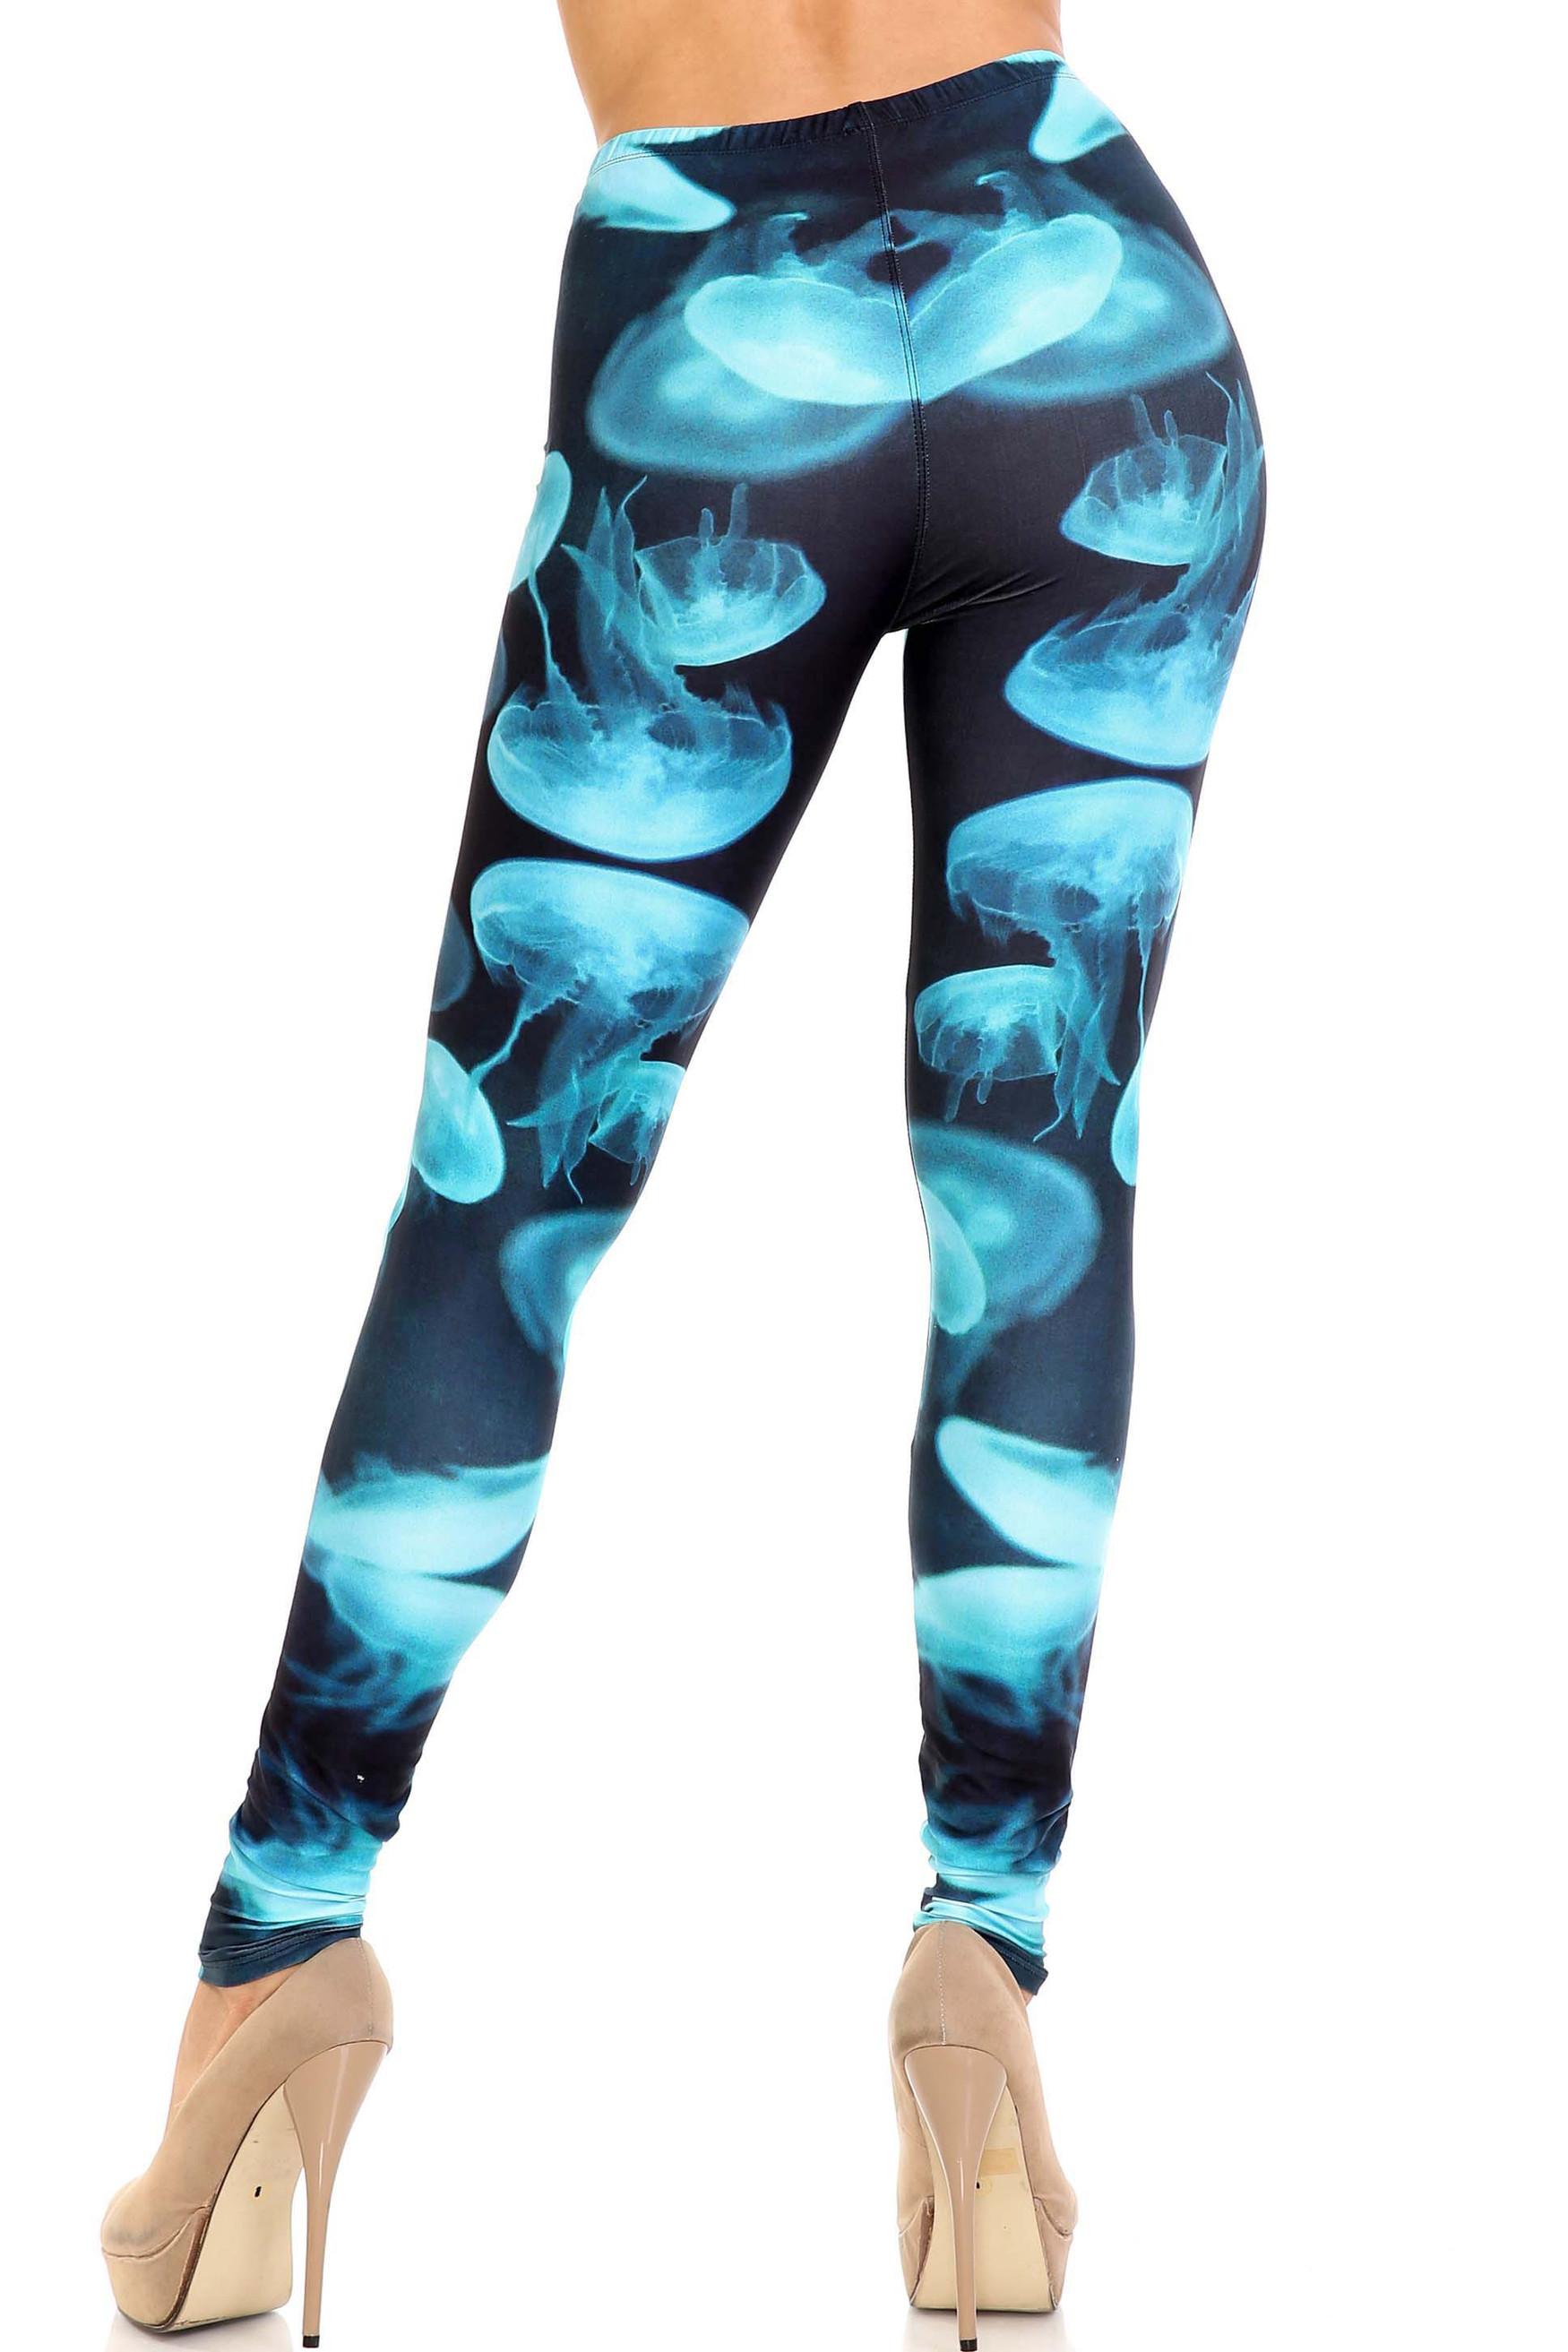 Creamy Soft Electric Blue Jelly Fish Leggings - USA Fashion™